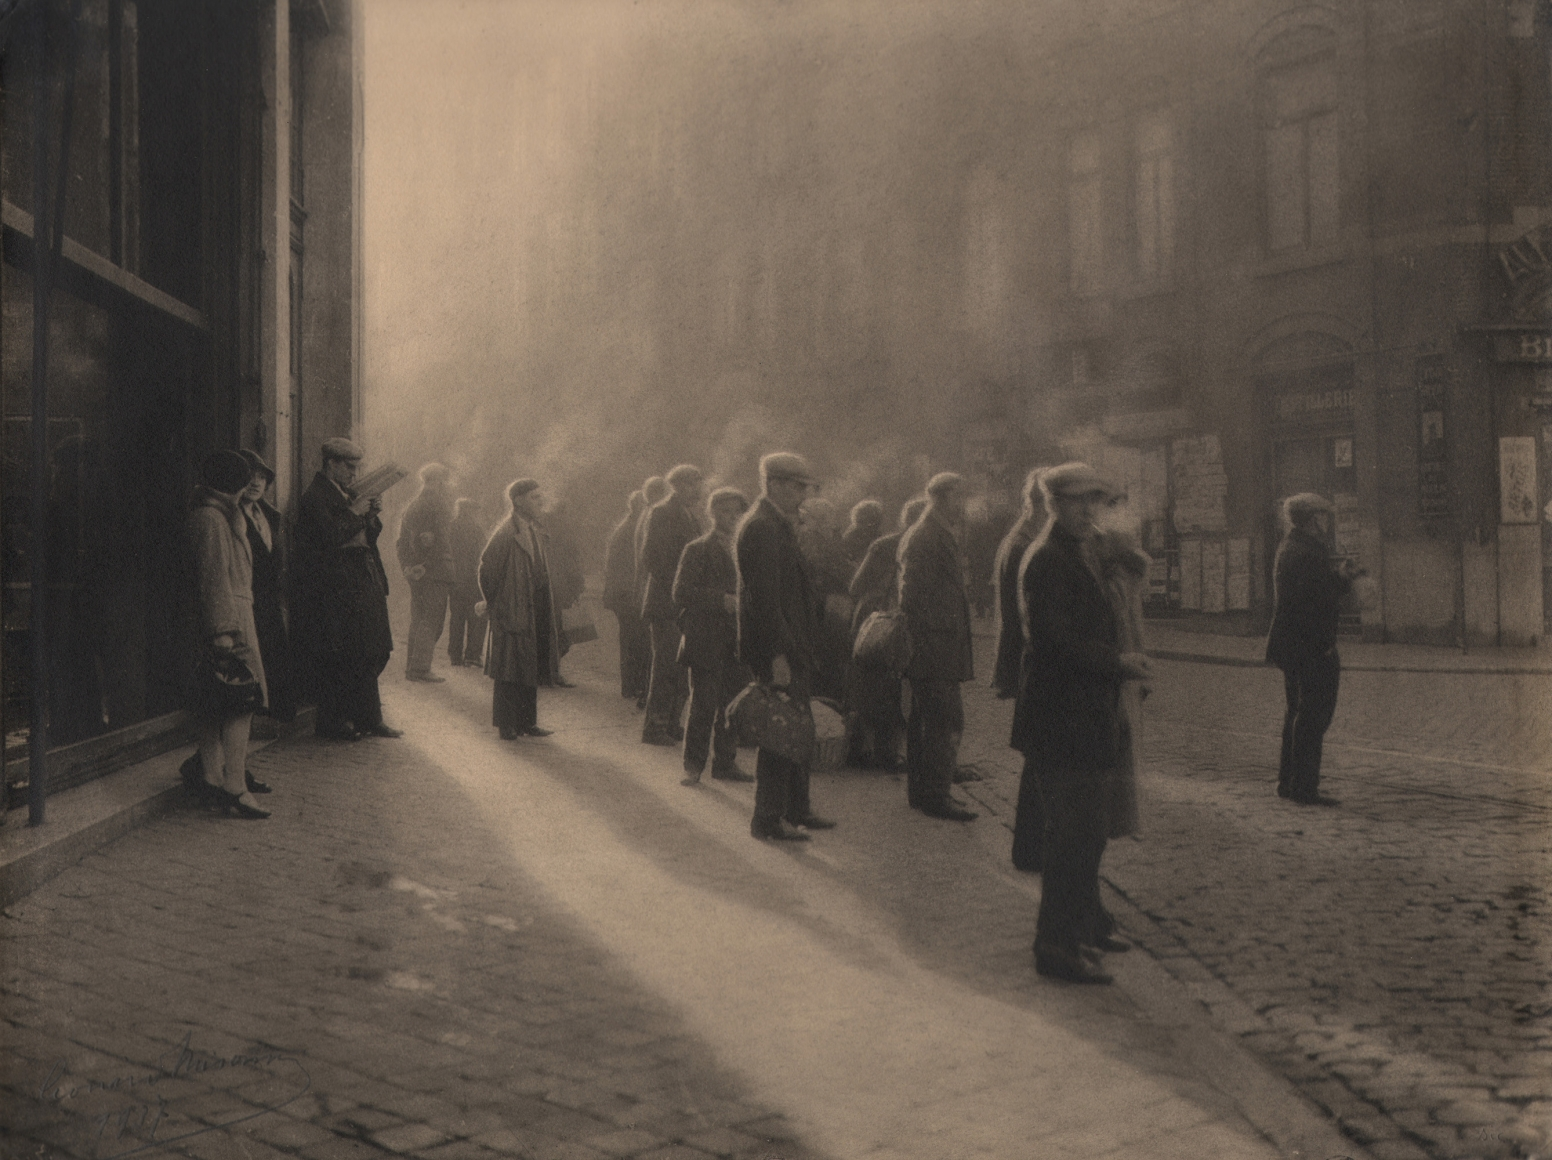 08. Léonard Misonne, Première cigarette, 1927. Various figures, mostly capped men, stand on the sidewalk, cigarette smoke rising above them. Sepia-toned print.